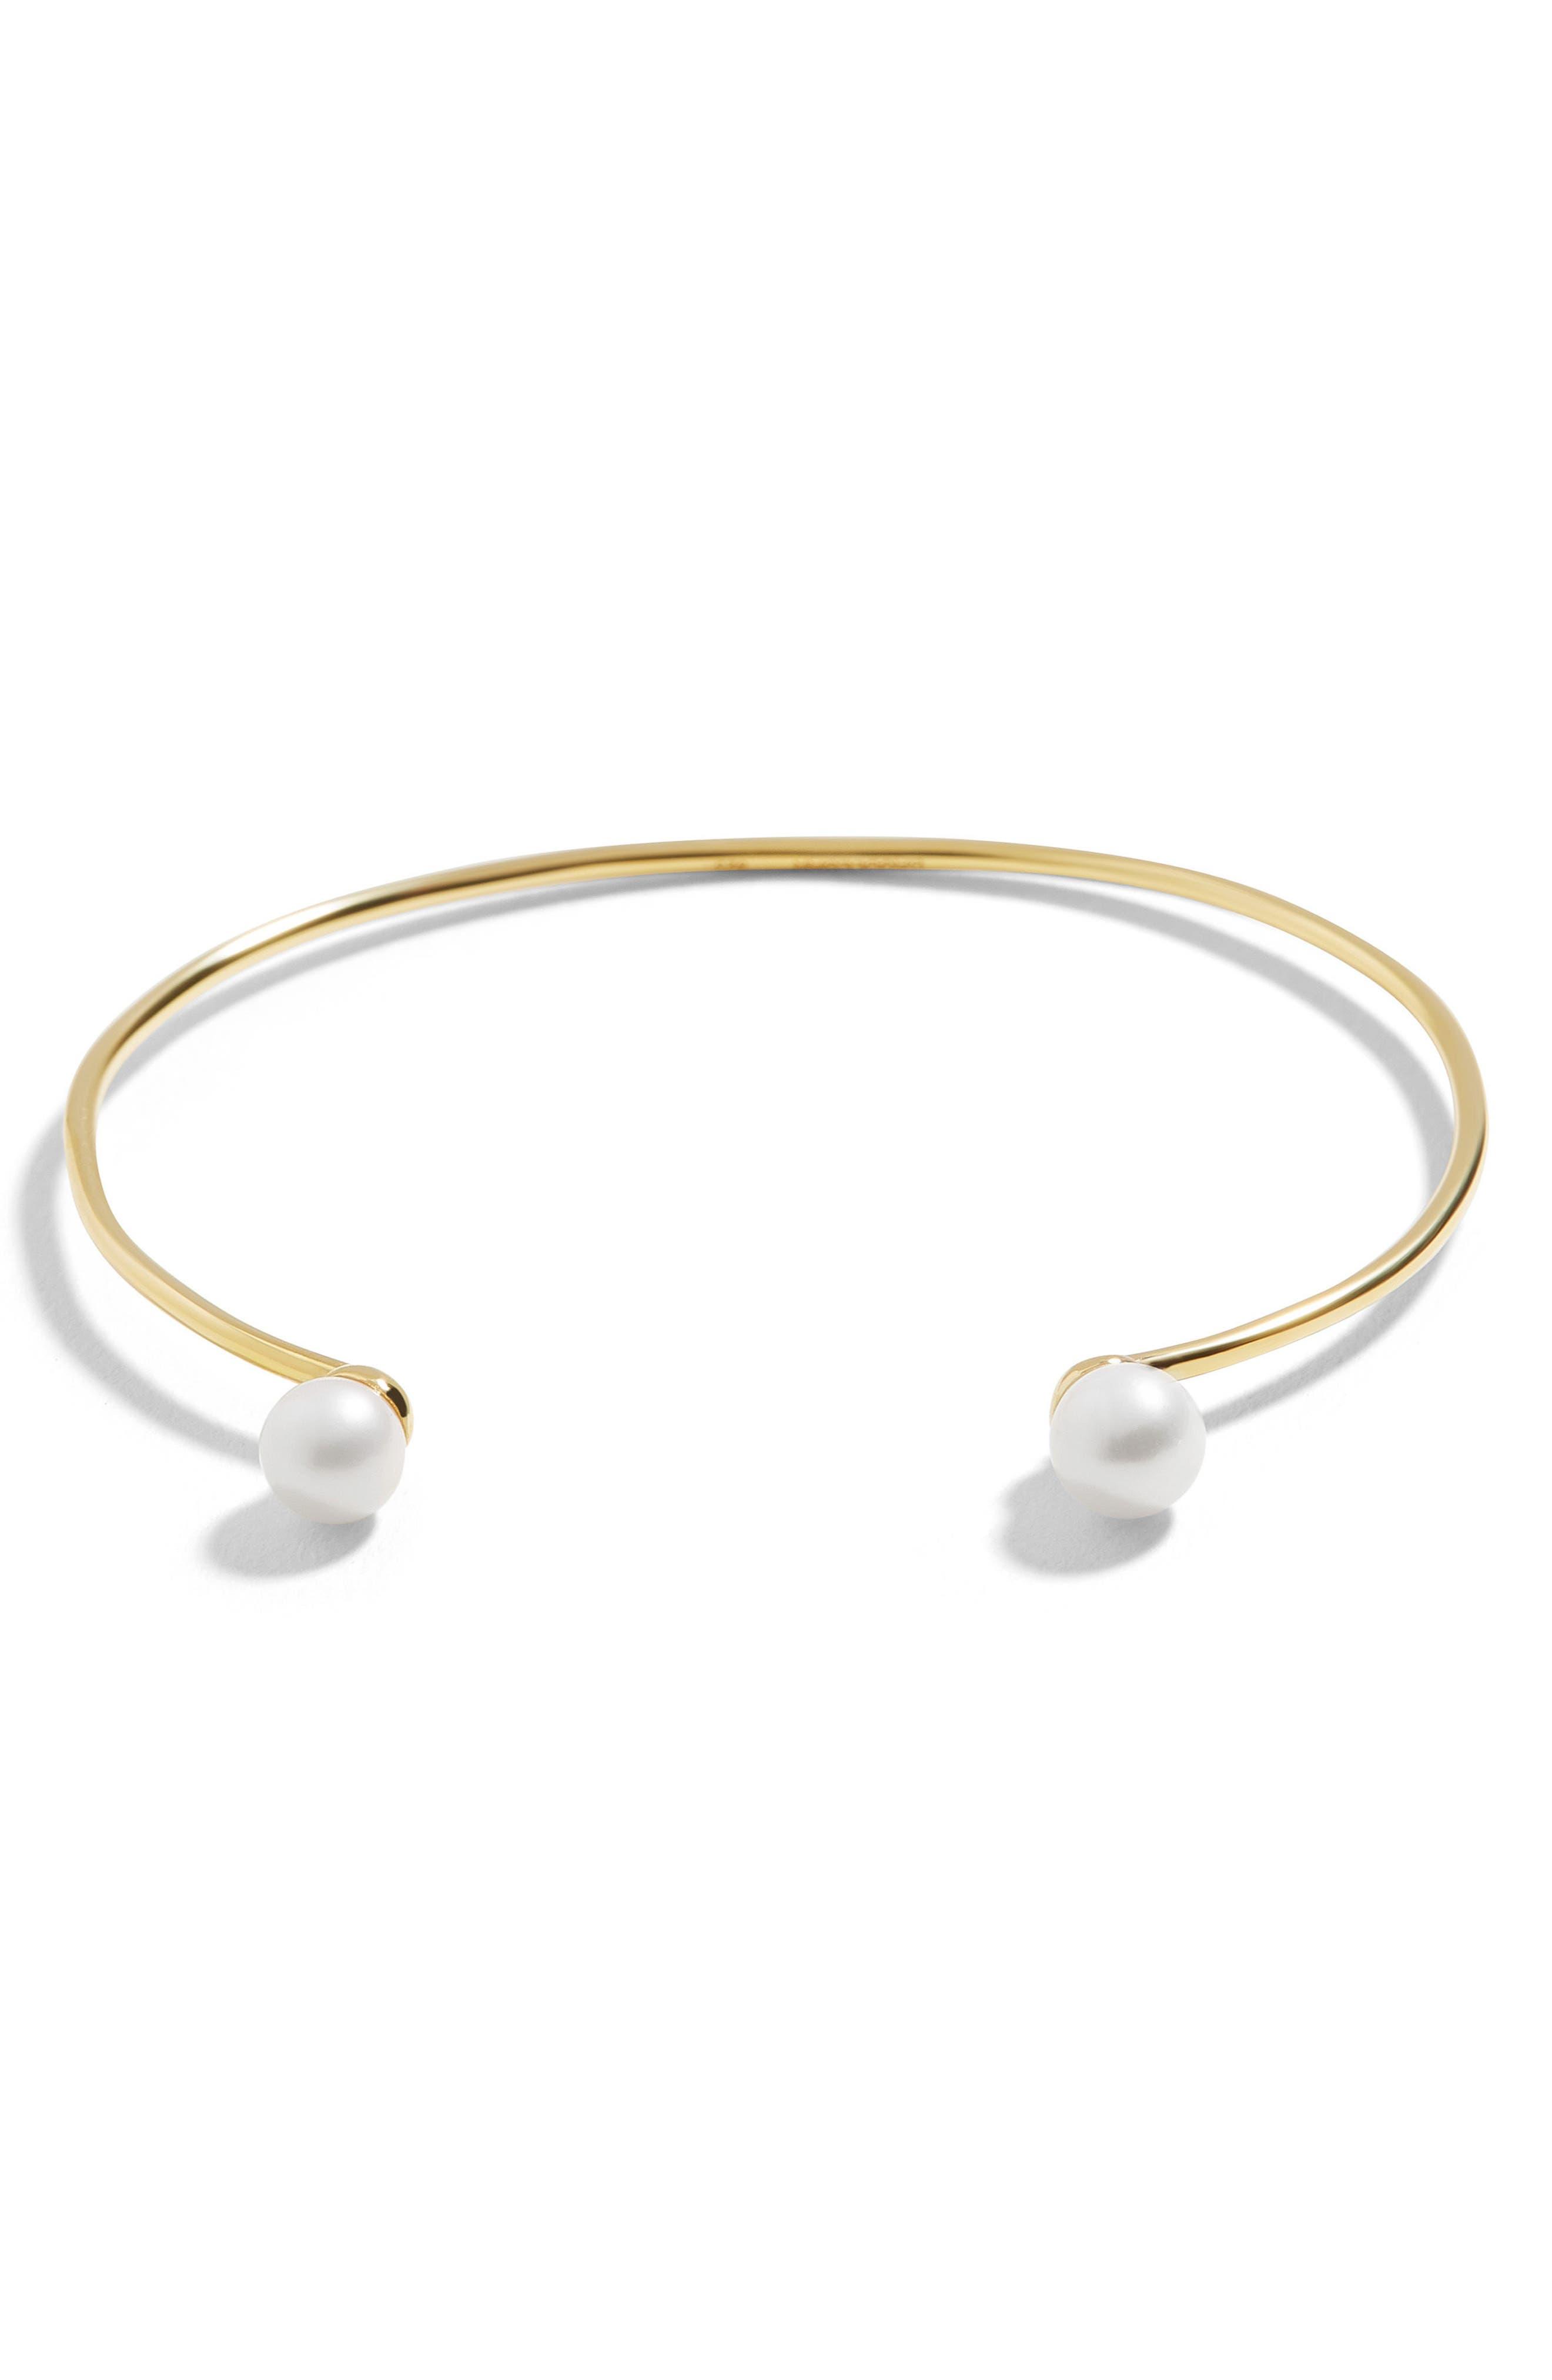 Perla Everyday Fine Cuff Bracelet,                             Main thumbnail 1, color,                             Pearl